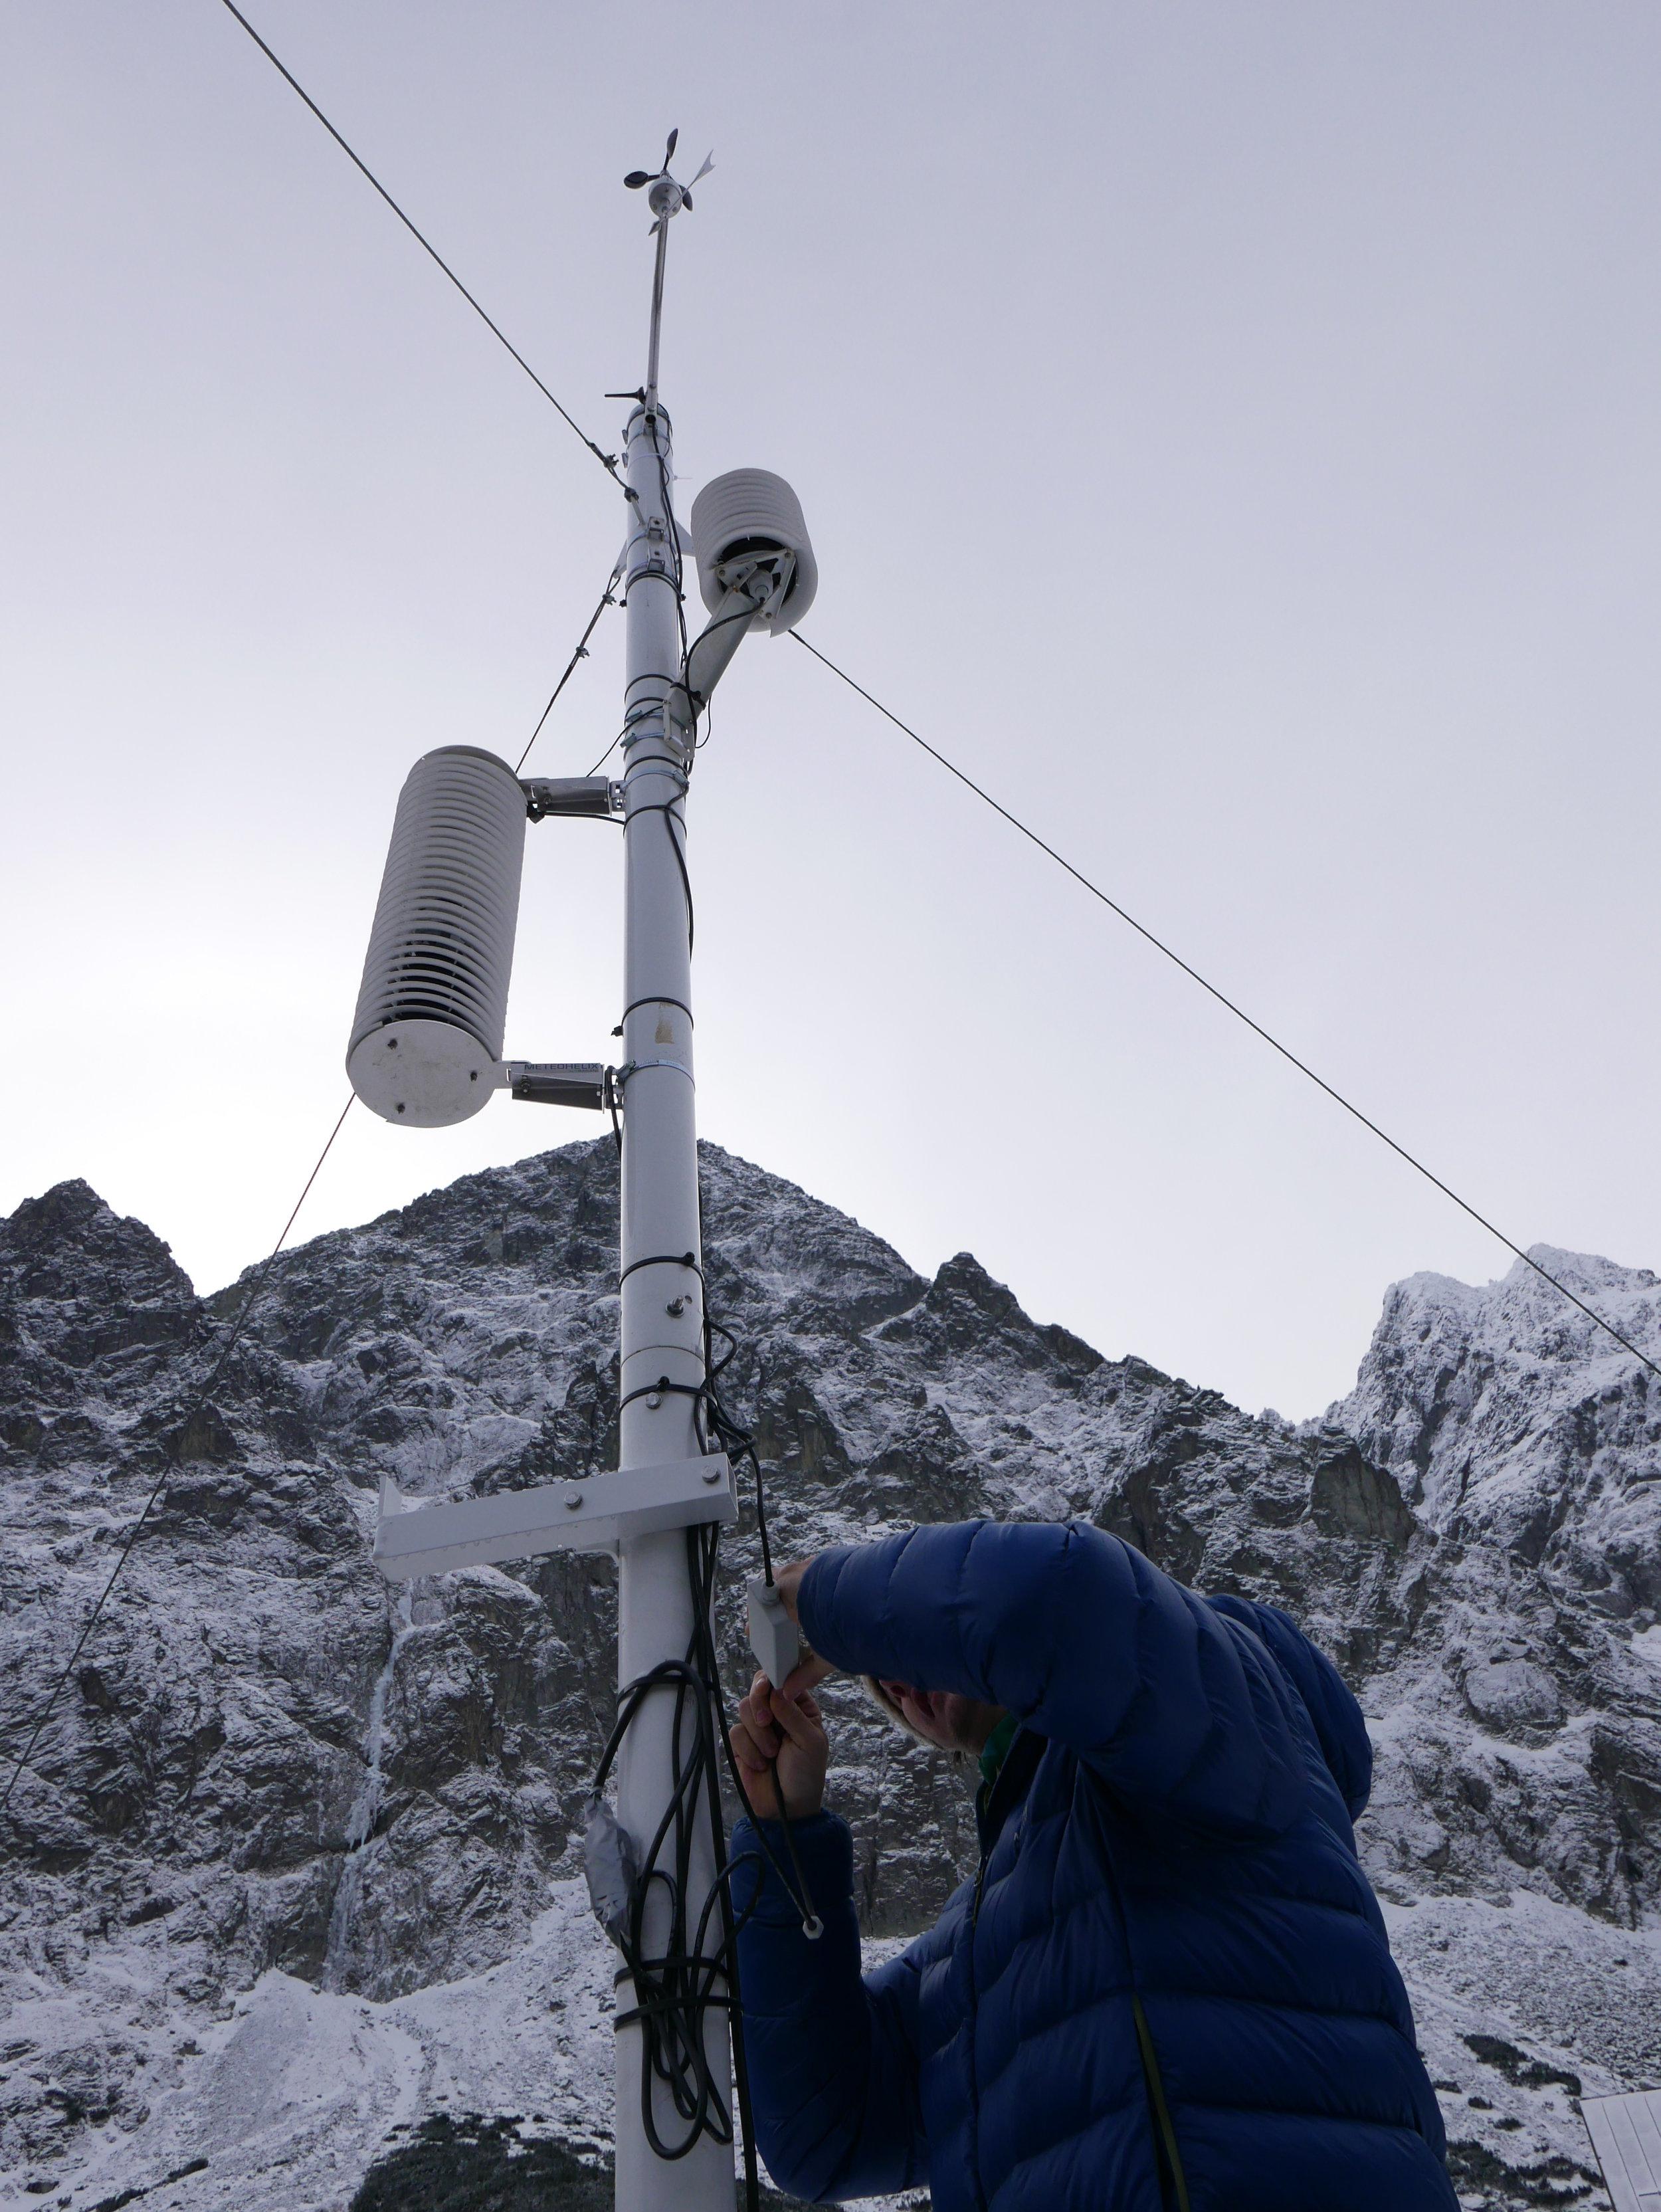 Sensor: MeteoHelix AWS. Location: Zelene pleso in the High Tatra mountains (Carpathian mountain range), Slovakia.